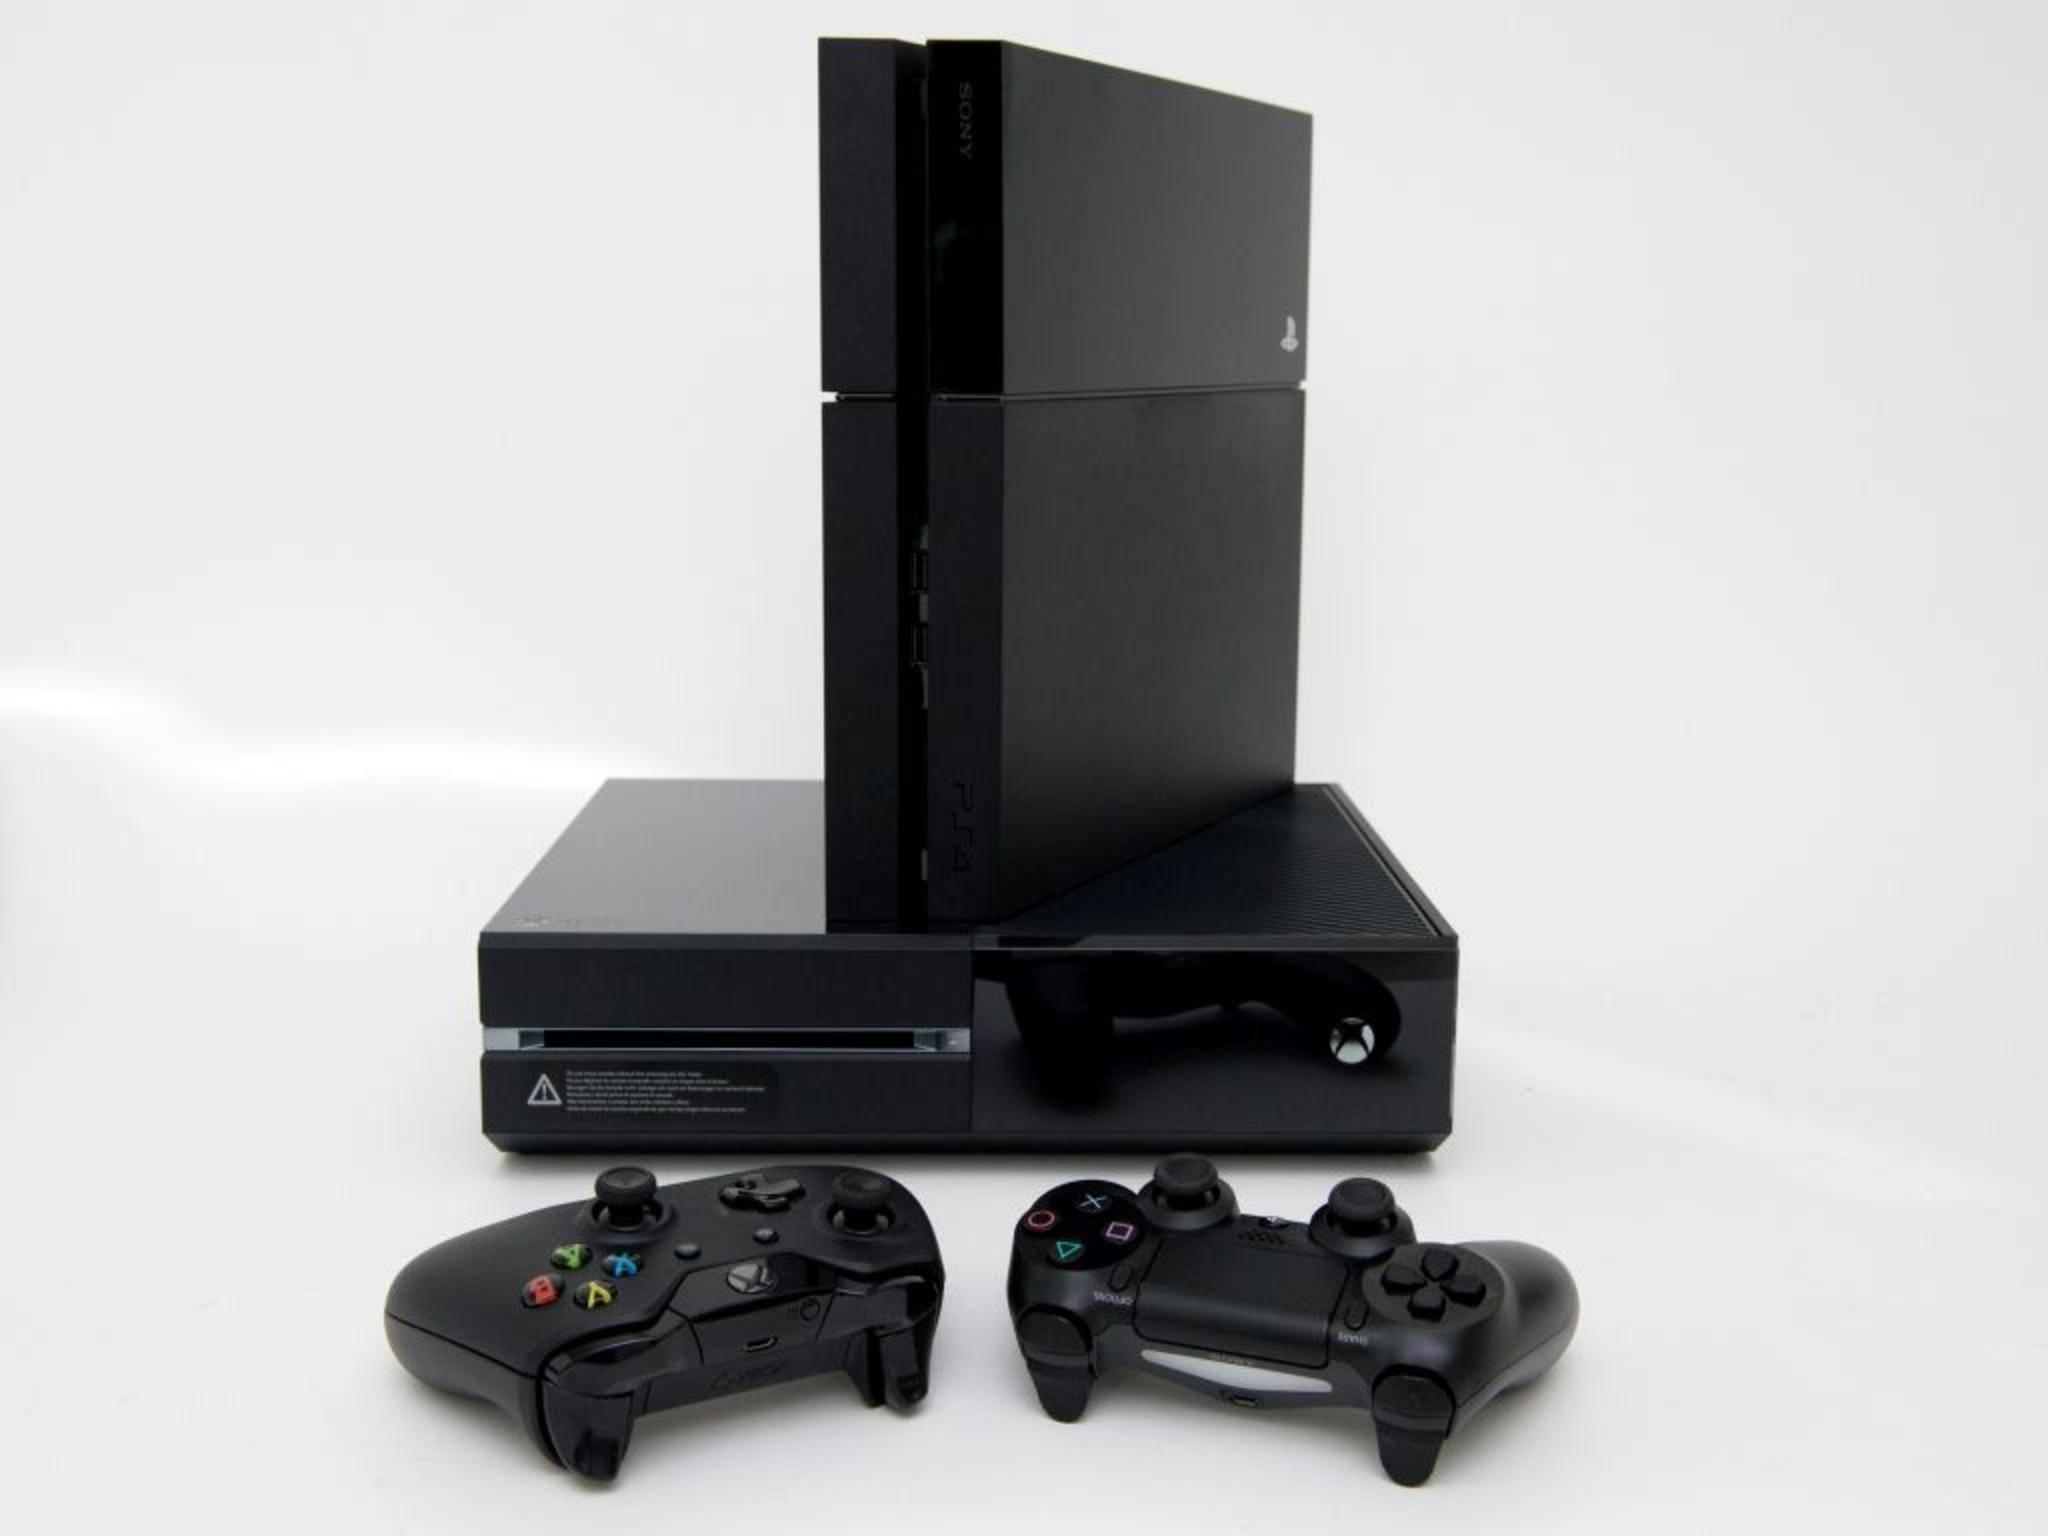 Playstation 4 vs. Microsoft Xbox One